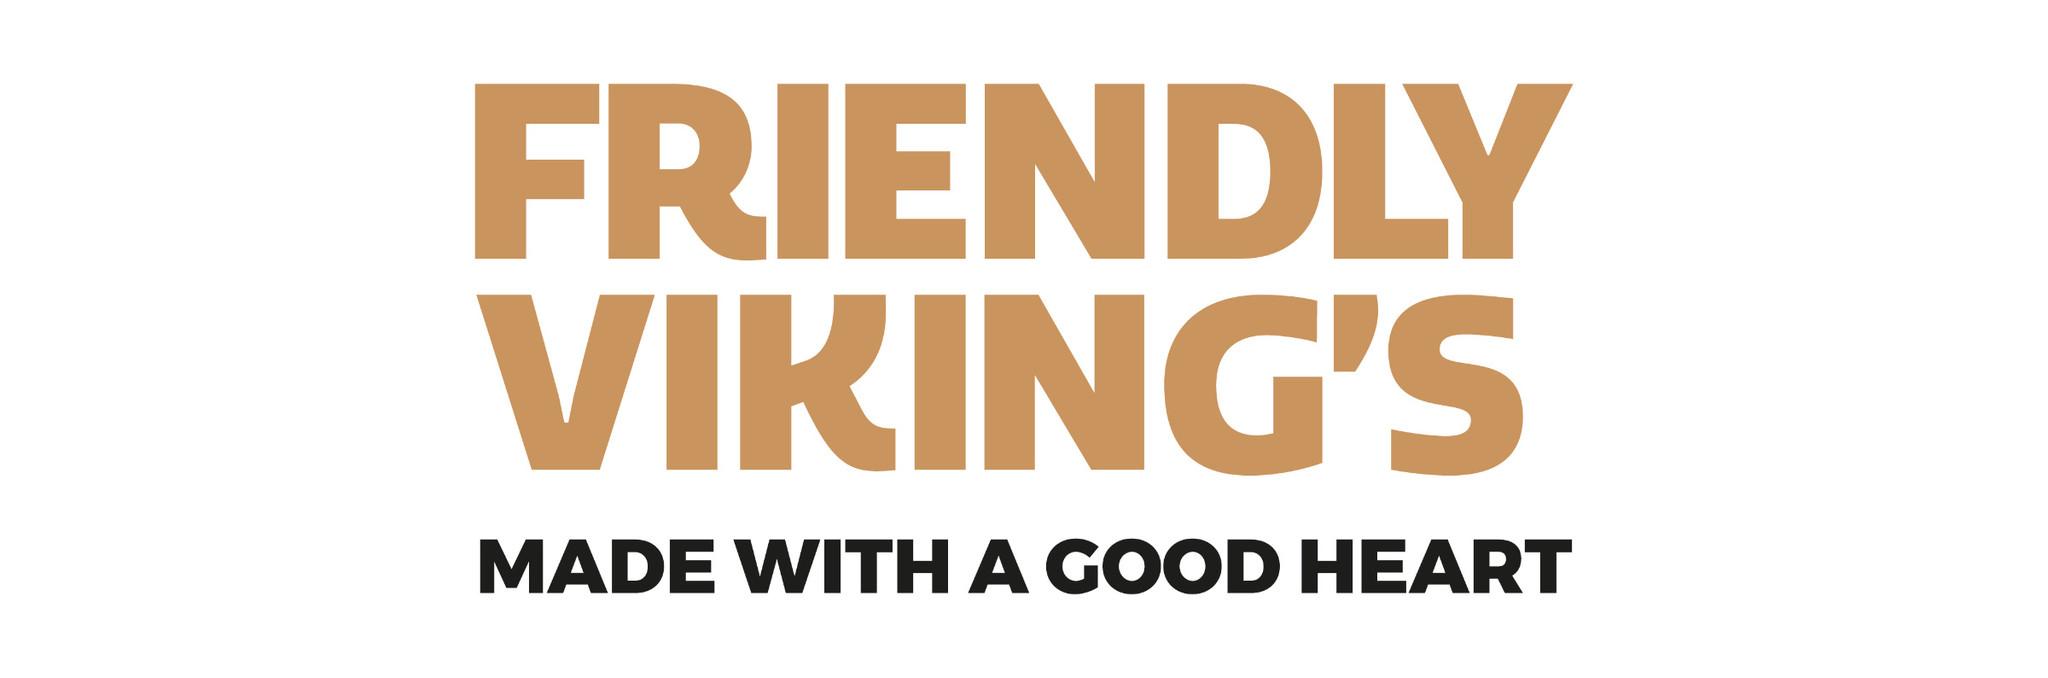 FRIENDLY VIKING'S